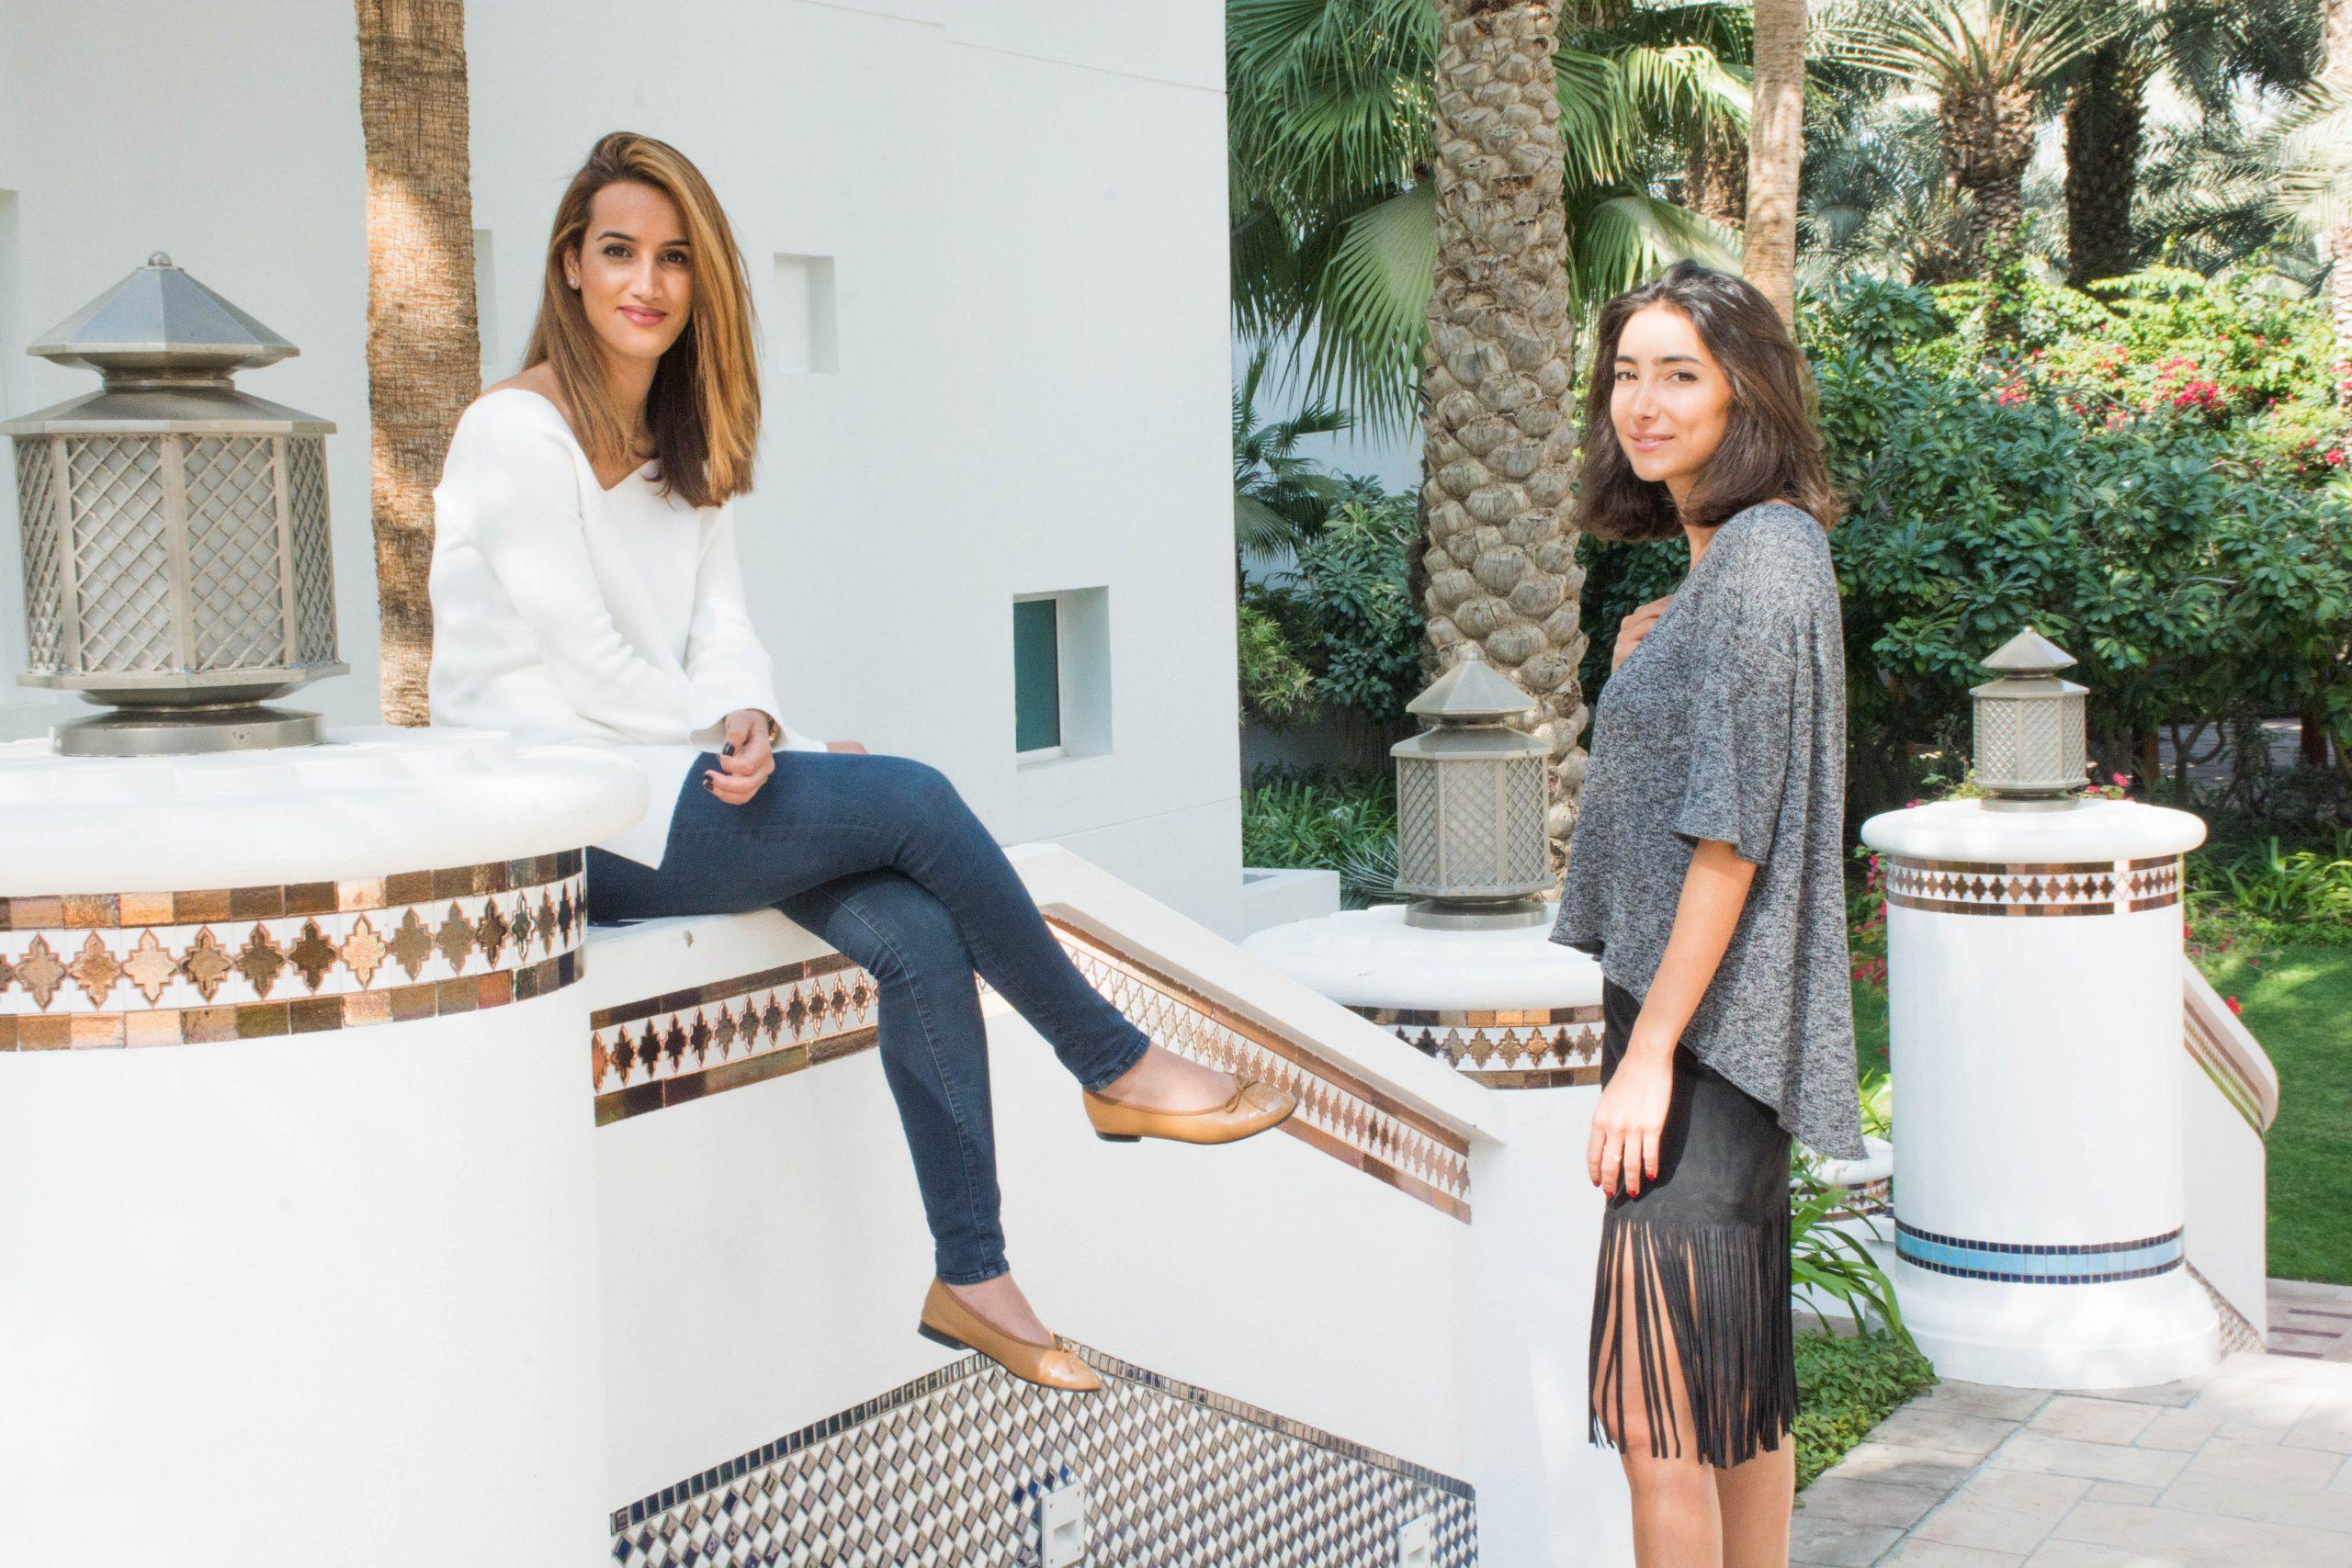 From left to right: Emergeast founders Dima Abdul Kader and Nikki Meftah